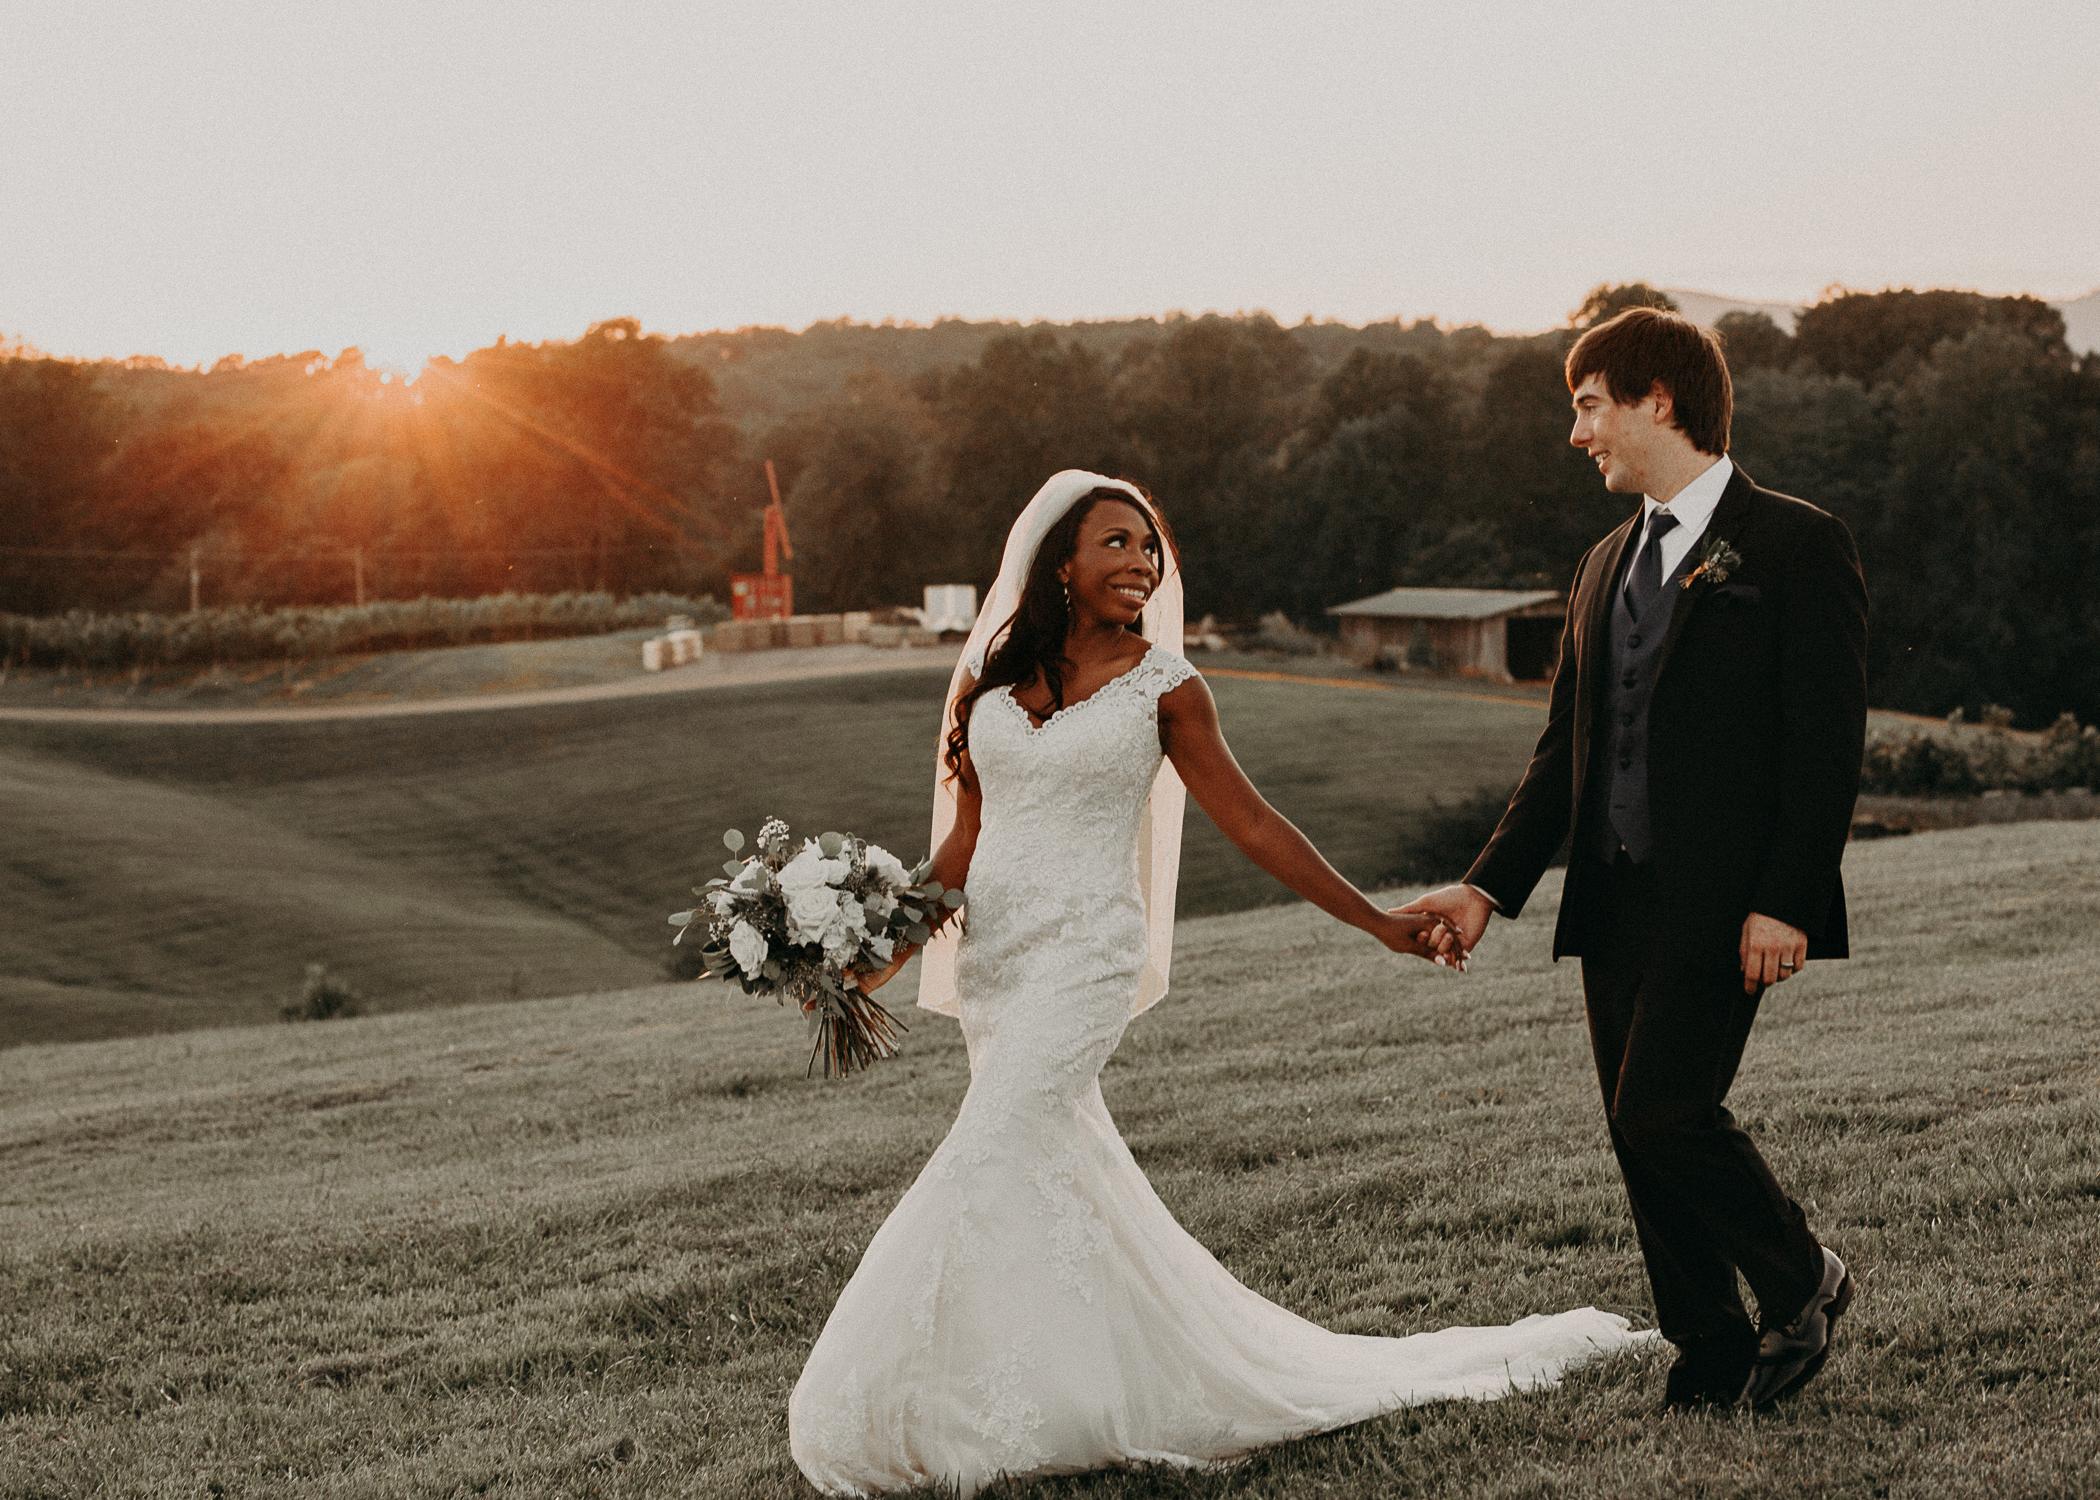 81- Kaya_vineyard_dahlonega_wedding_venue_bride_and_groom_sunset_pictures_aline_marin_photography.jpg